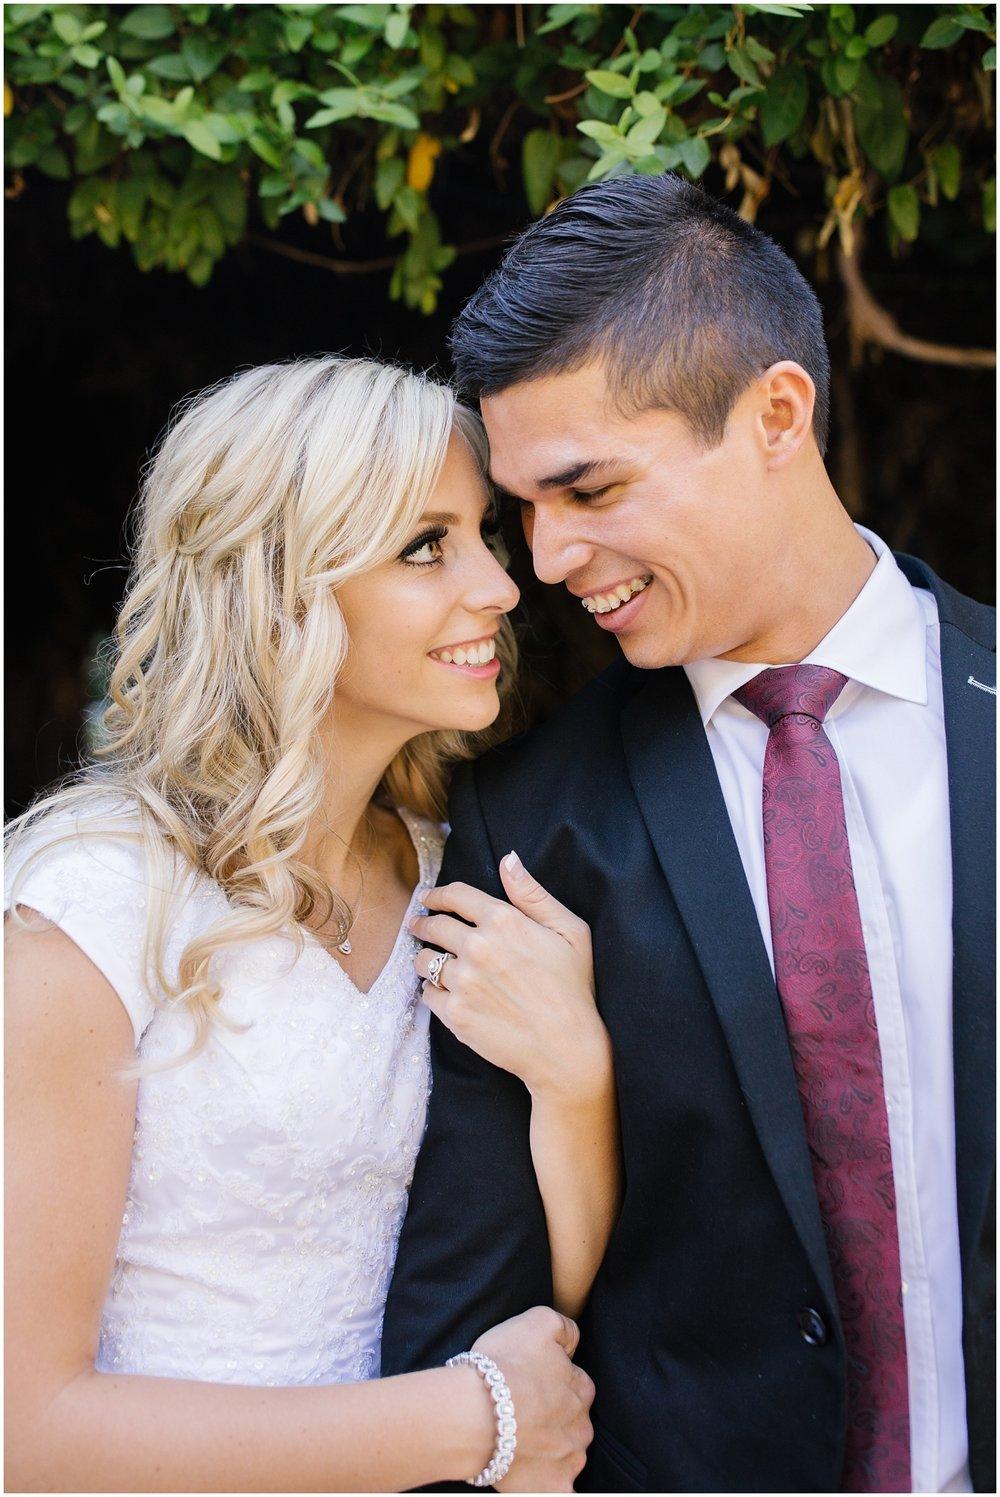 CHBridals-15_Lizzie-B-Imagery-Utah-Wedding-Photographer-Salt-Lake-City-Park-City-Thanksgiving-Point-Ashton-Gardens.jpg